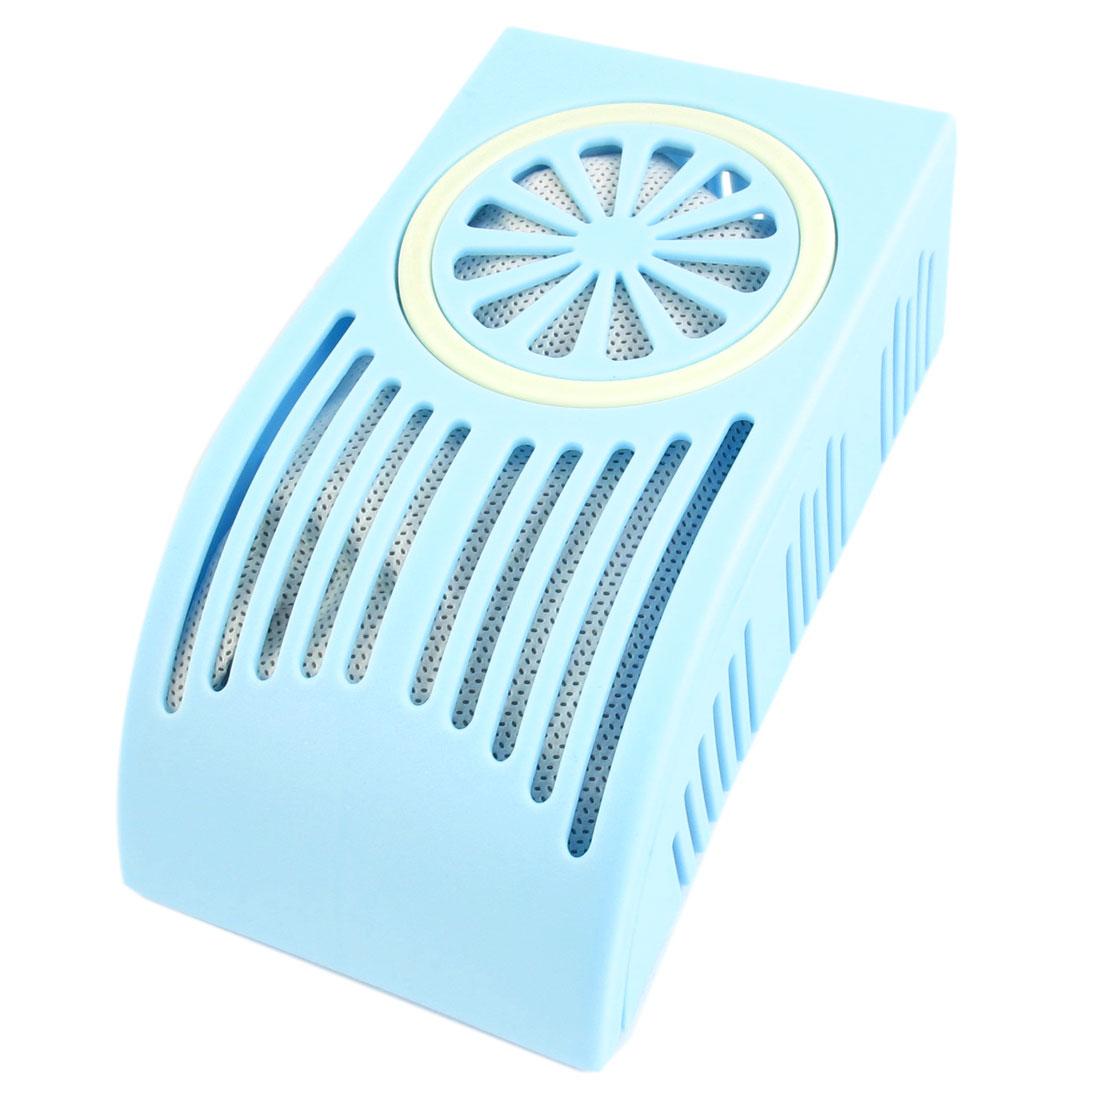 Refrigerator Fridge Bamboo Deodorant Odor Smell Remover Plastic Case